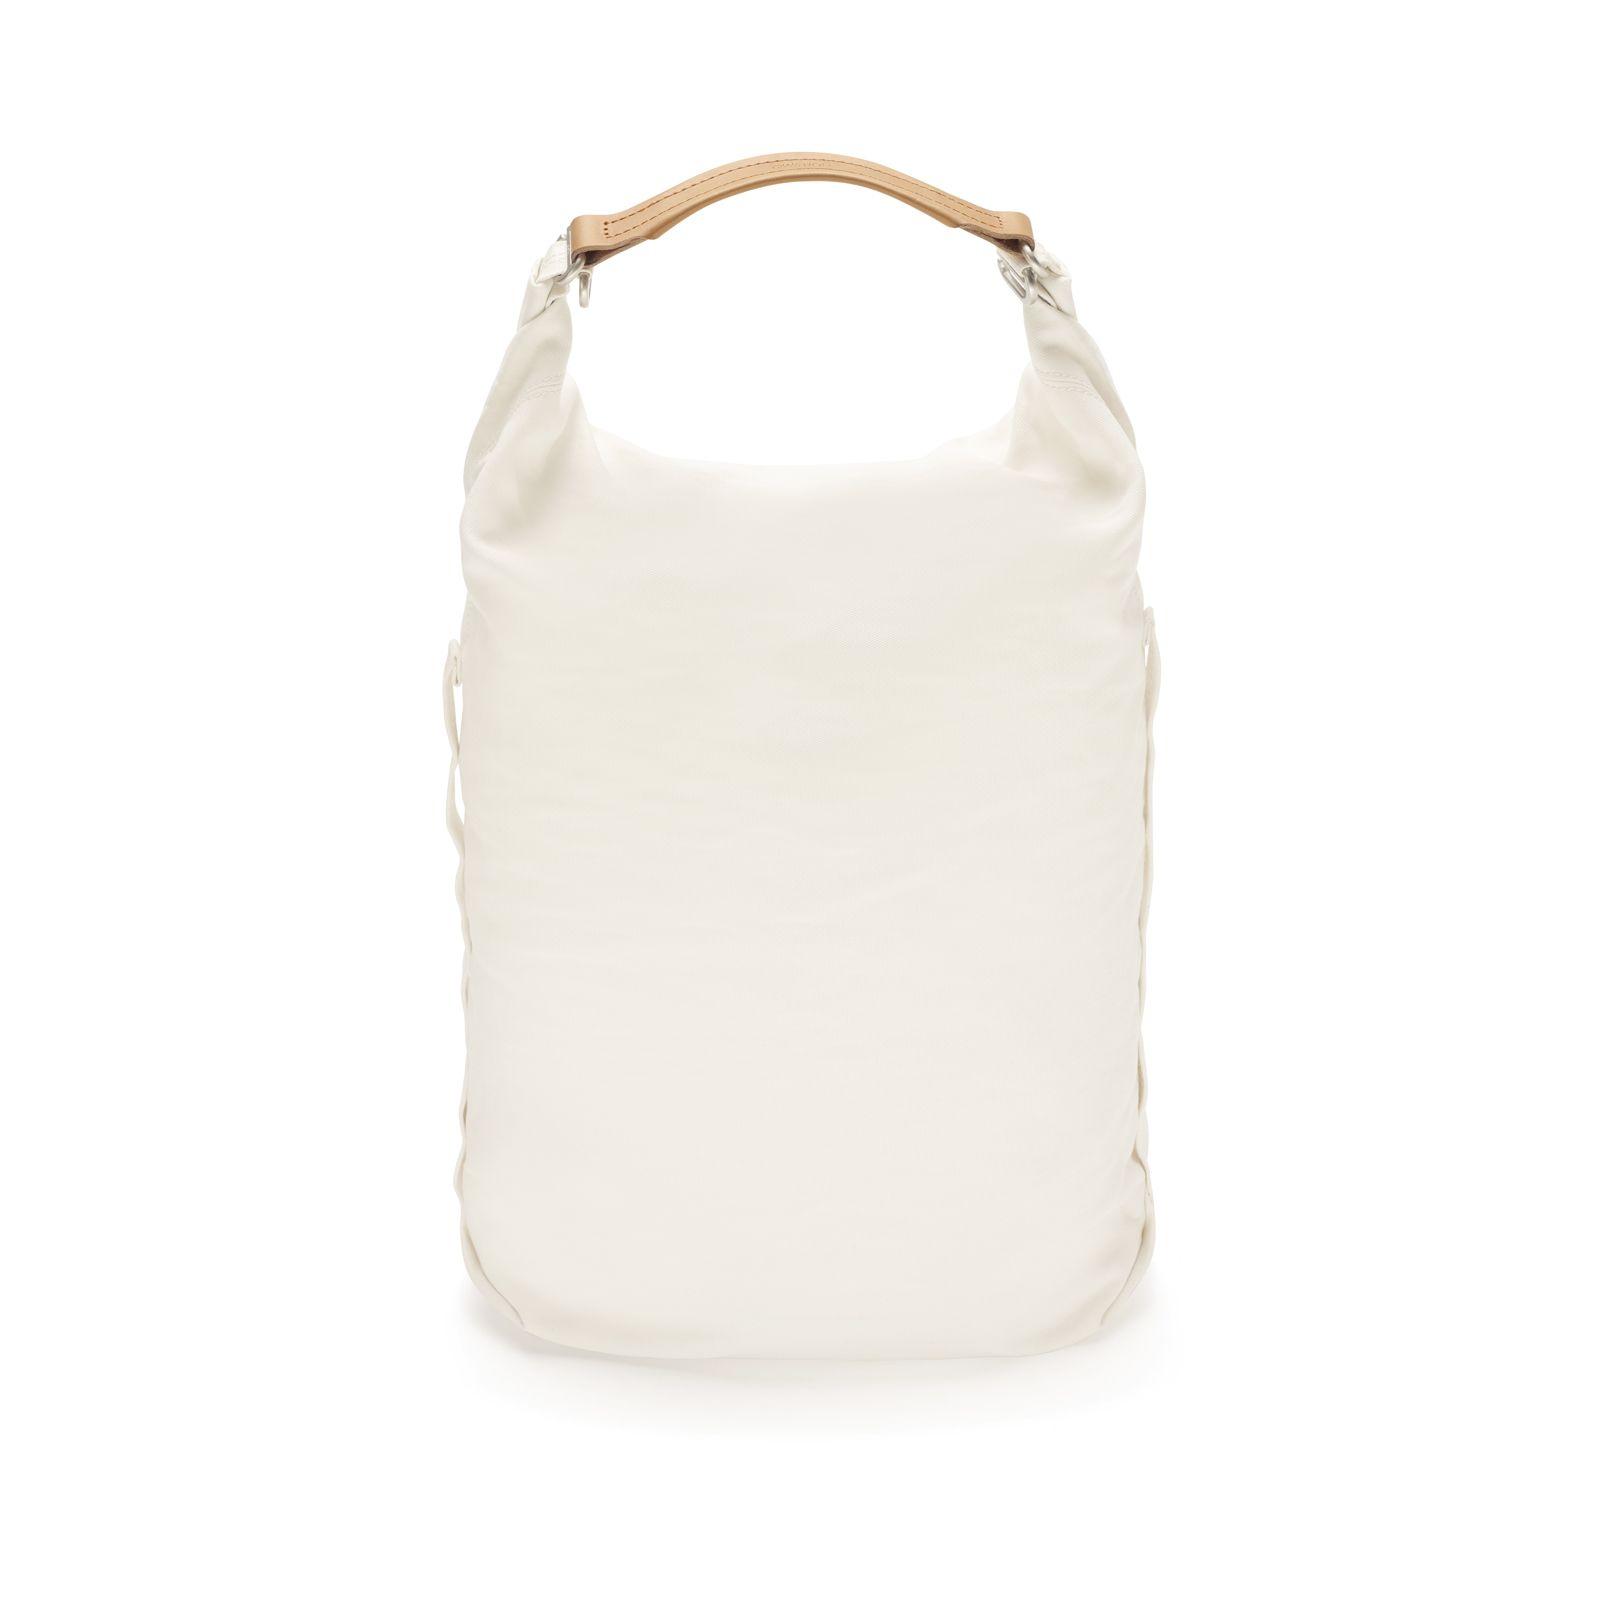 Roll Pack / Bananatex® - Natural White